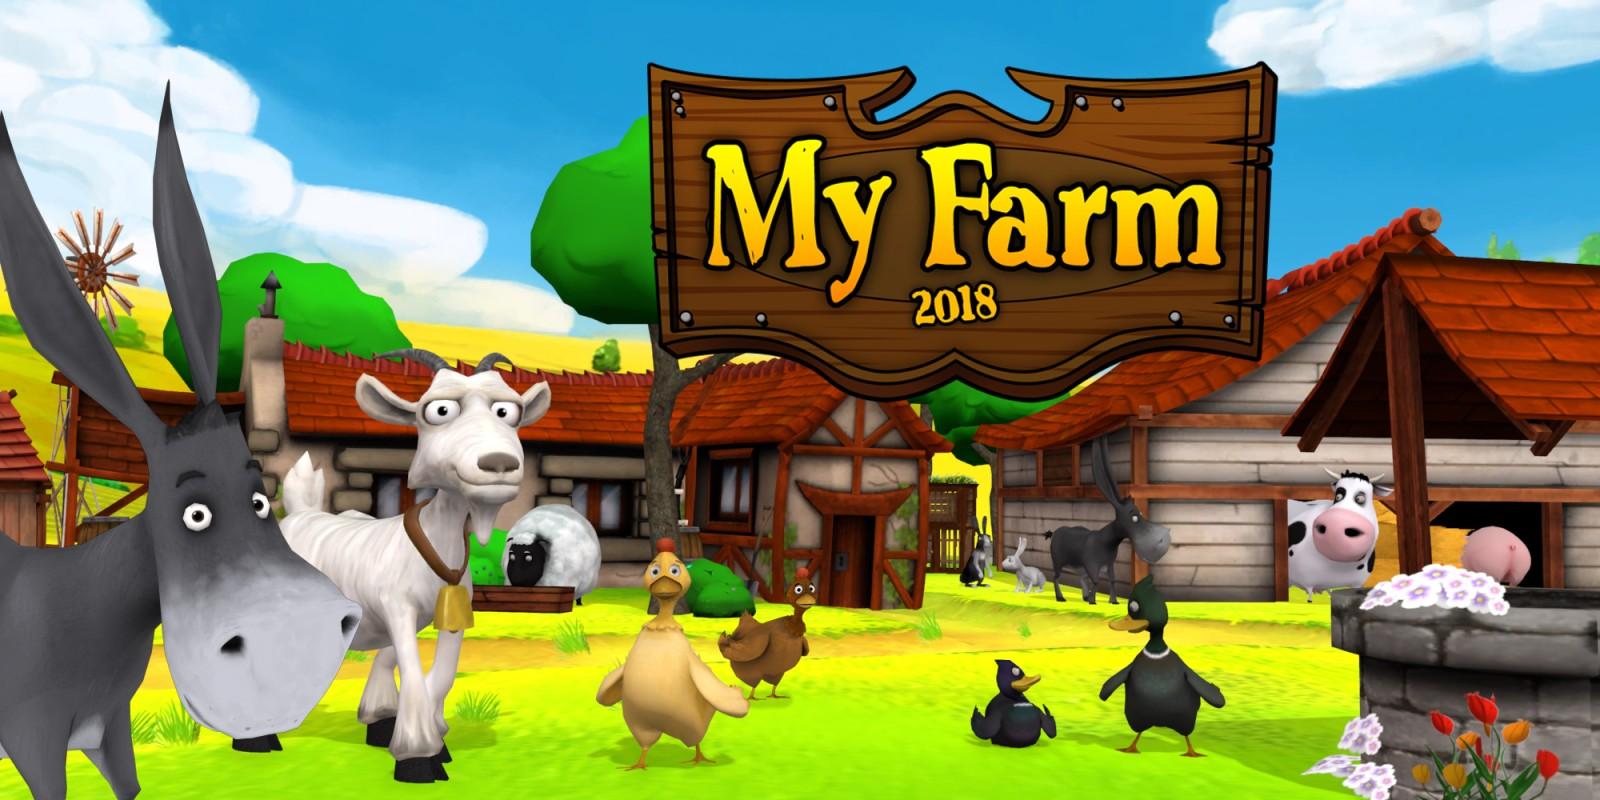 My Farm | Nintendo Switch download software | Games | Nintendo